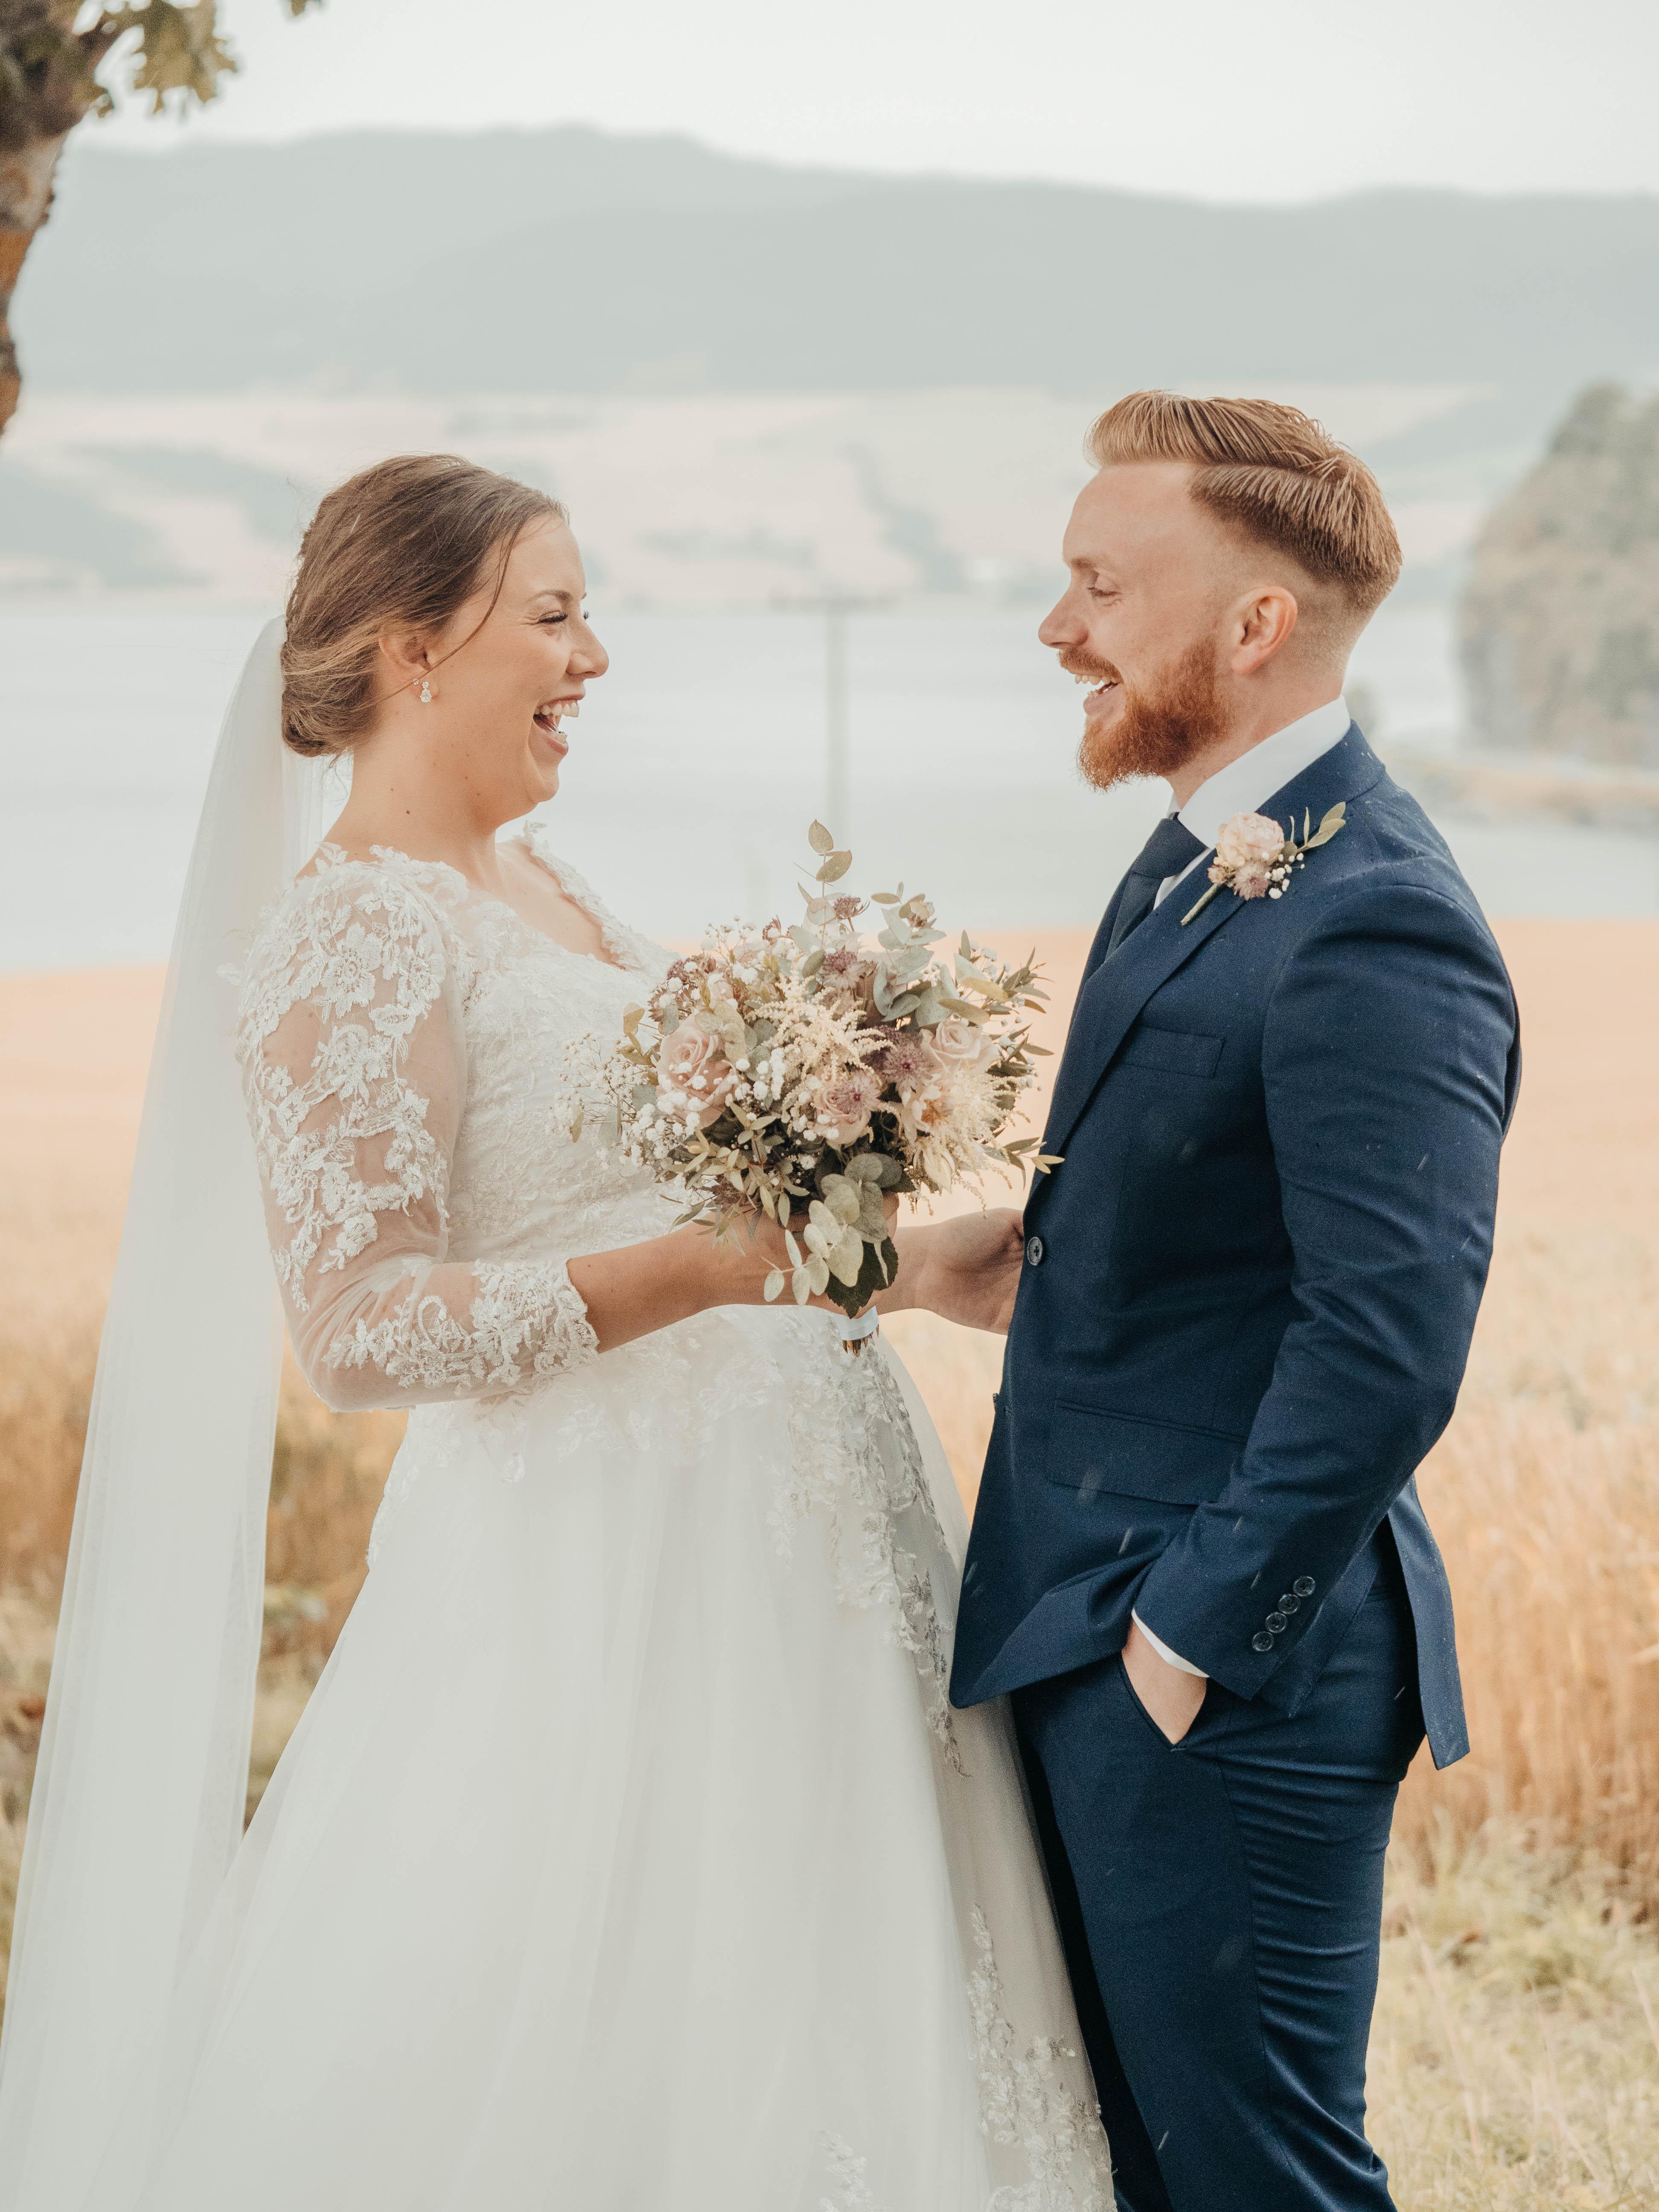 Tonje og Aleksander 2019 - Wedding